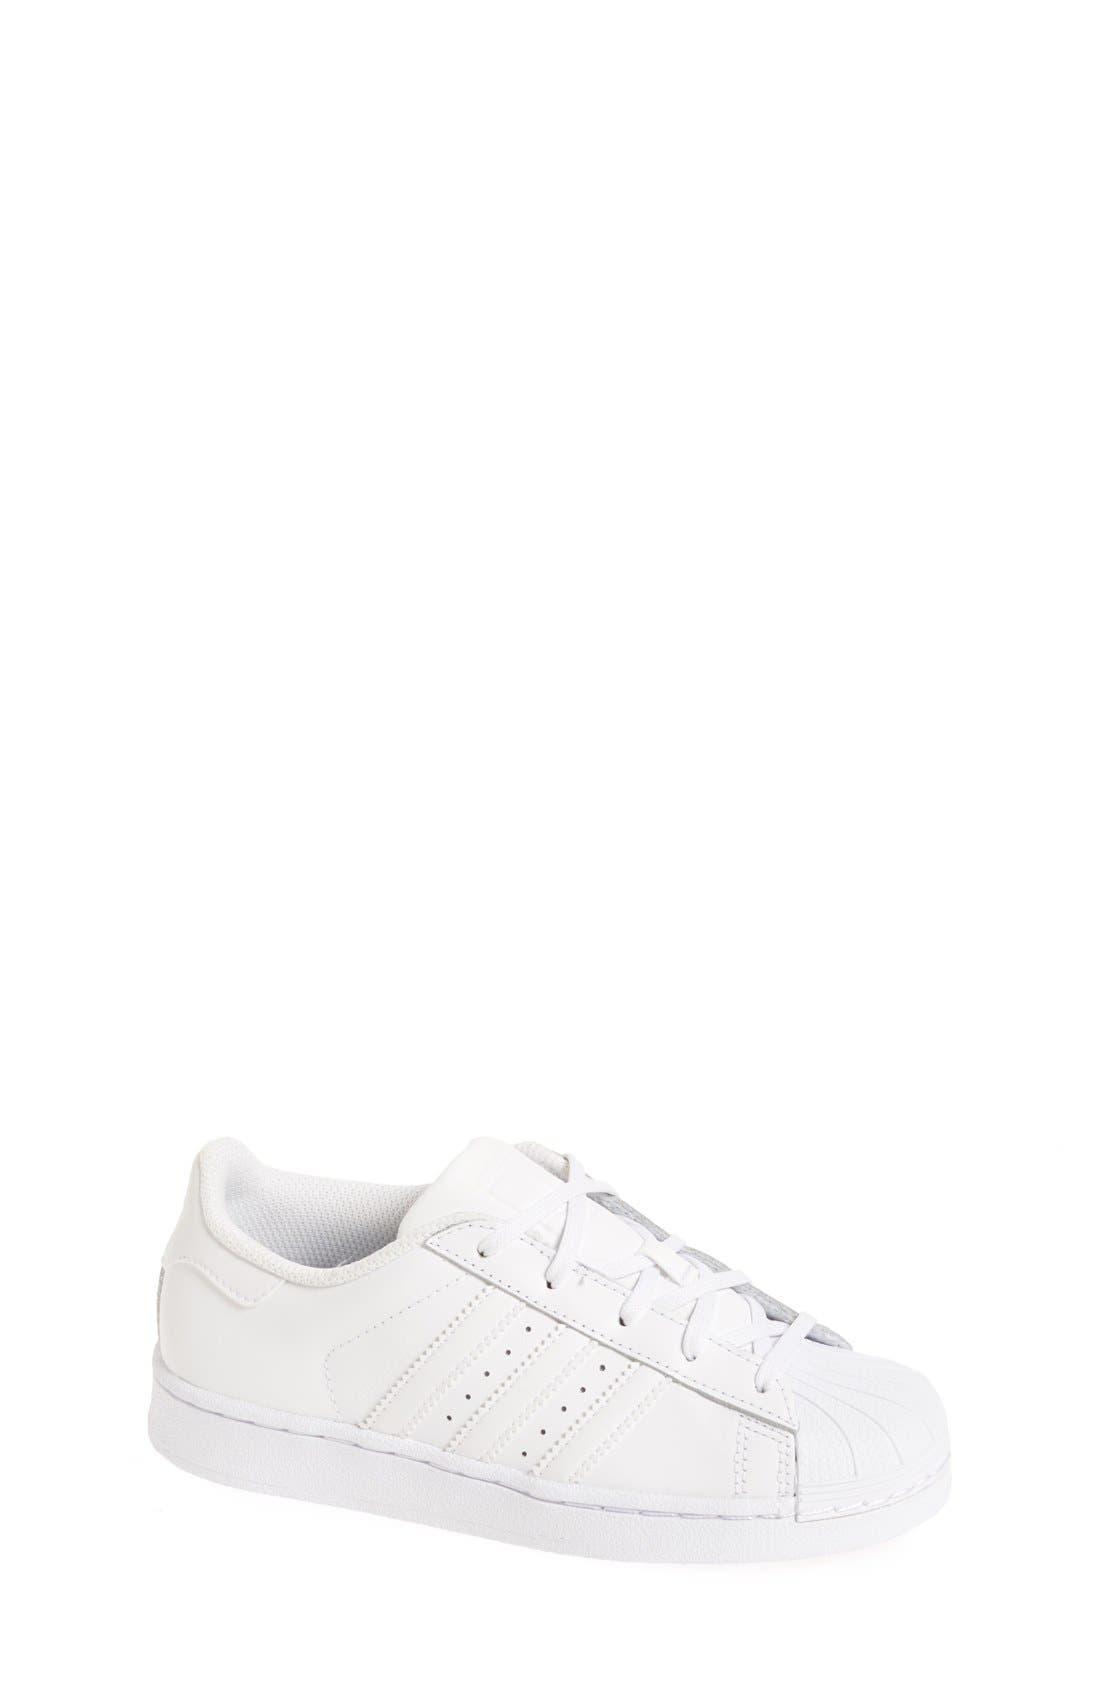 'Superstar Foundation' Sneaker,                         Main,                         color, White/ White